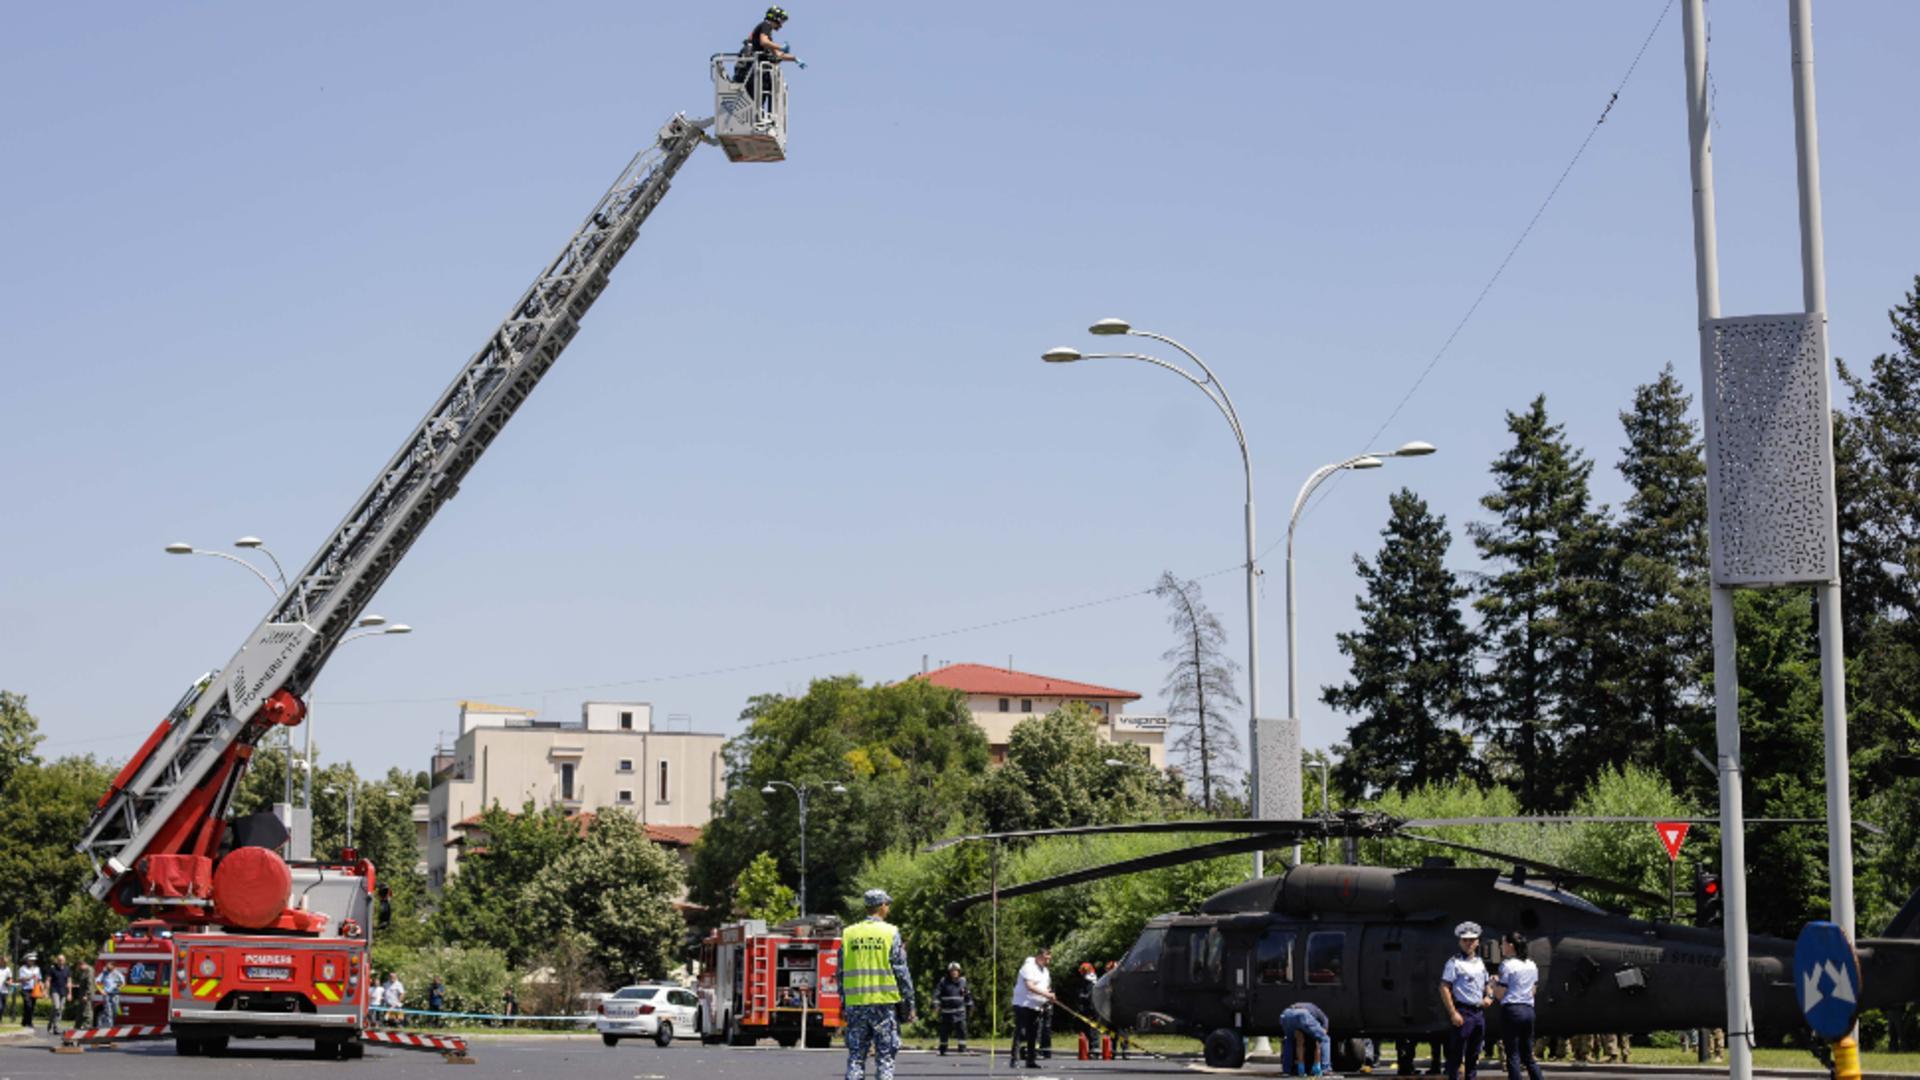 Elicopter prăbușit în intersecție / Foto: Inquam Photos